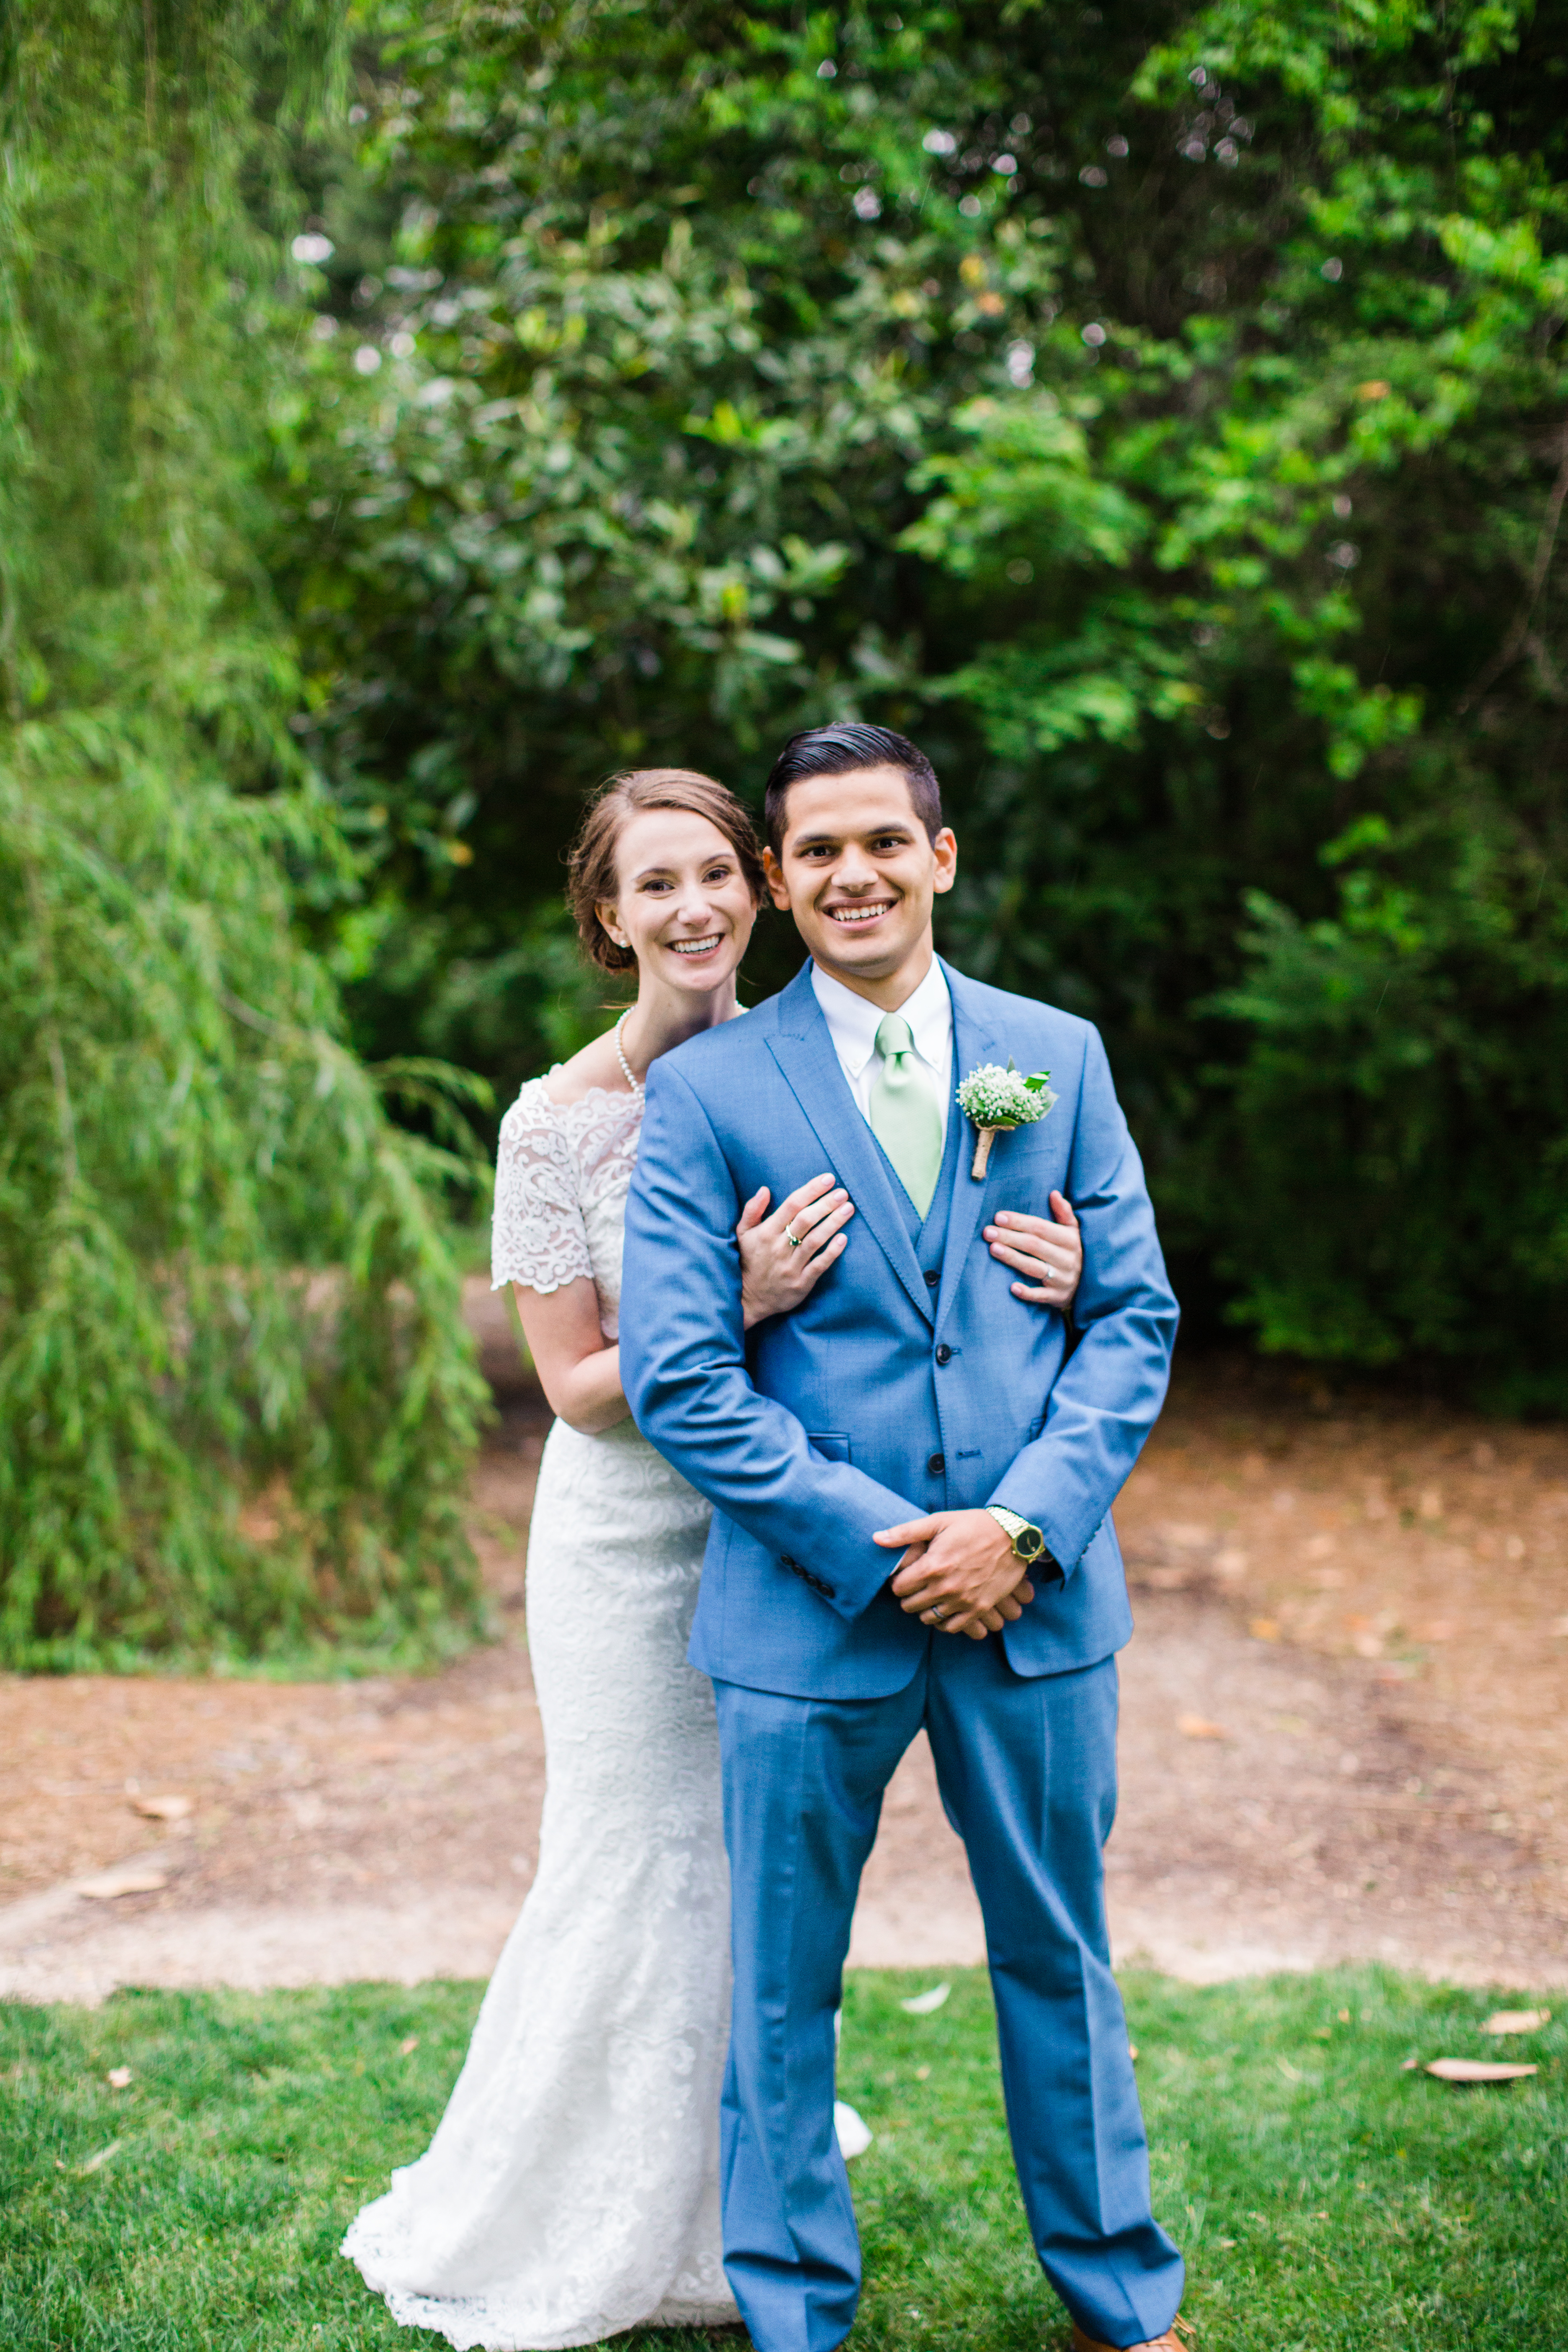 Asterisk Photo_Glaccum Wedding Preview-18